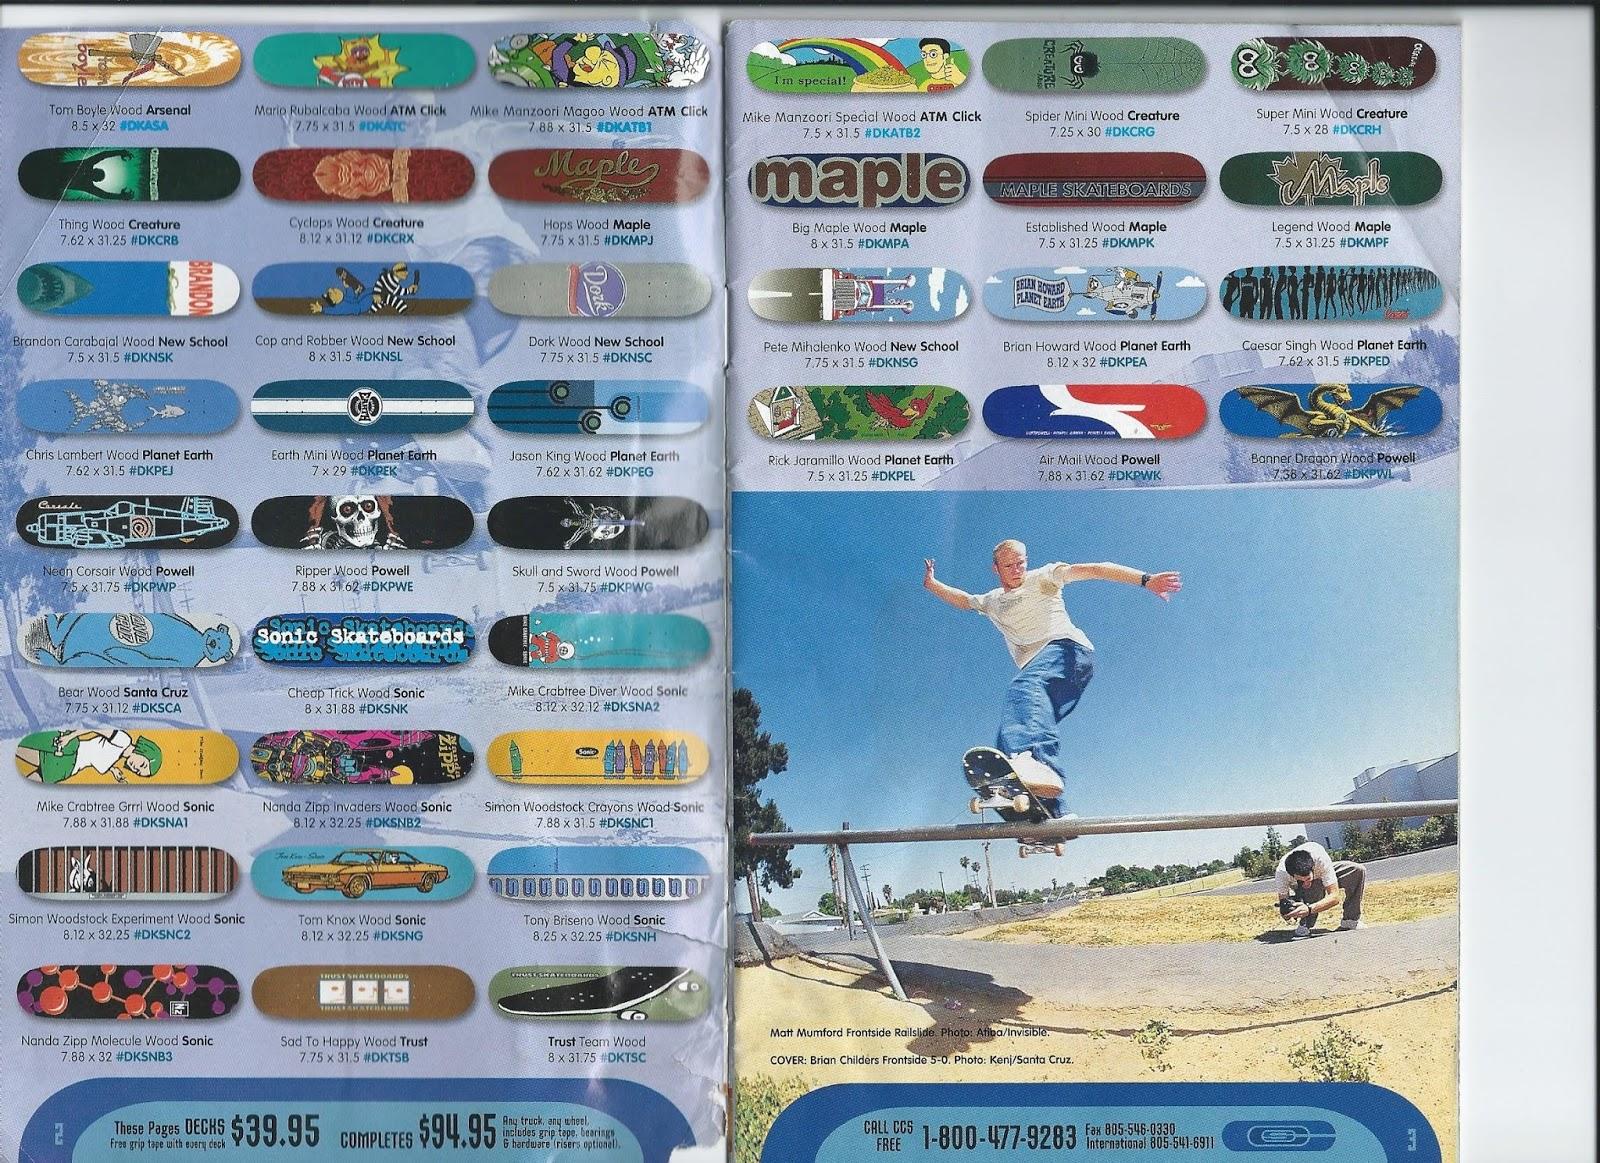 90's Skateboard Nostalgia: CCS Summer 1996 Catalog